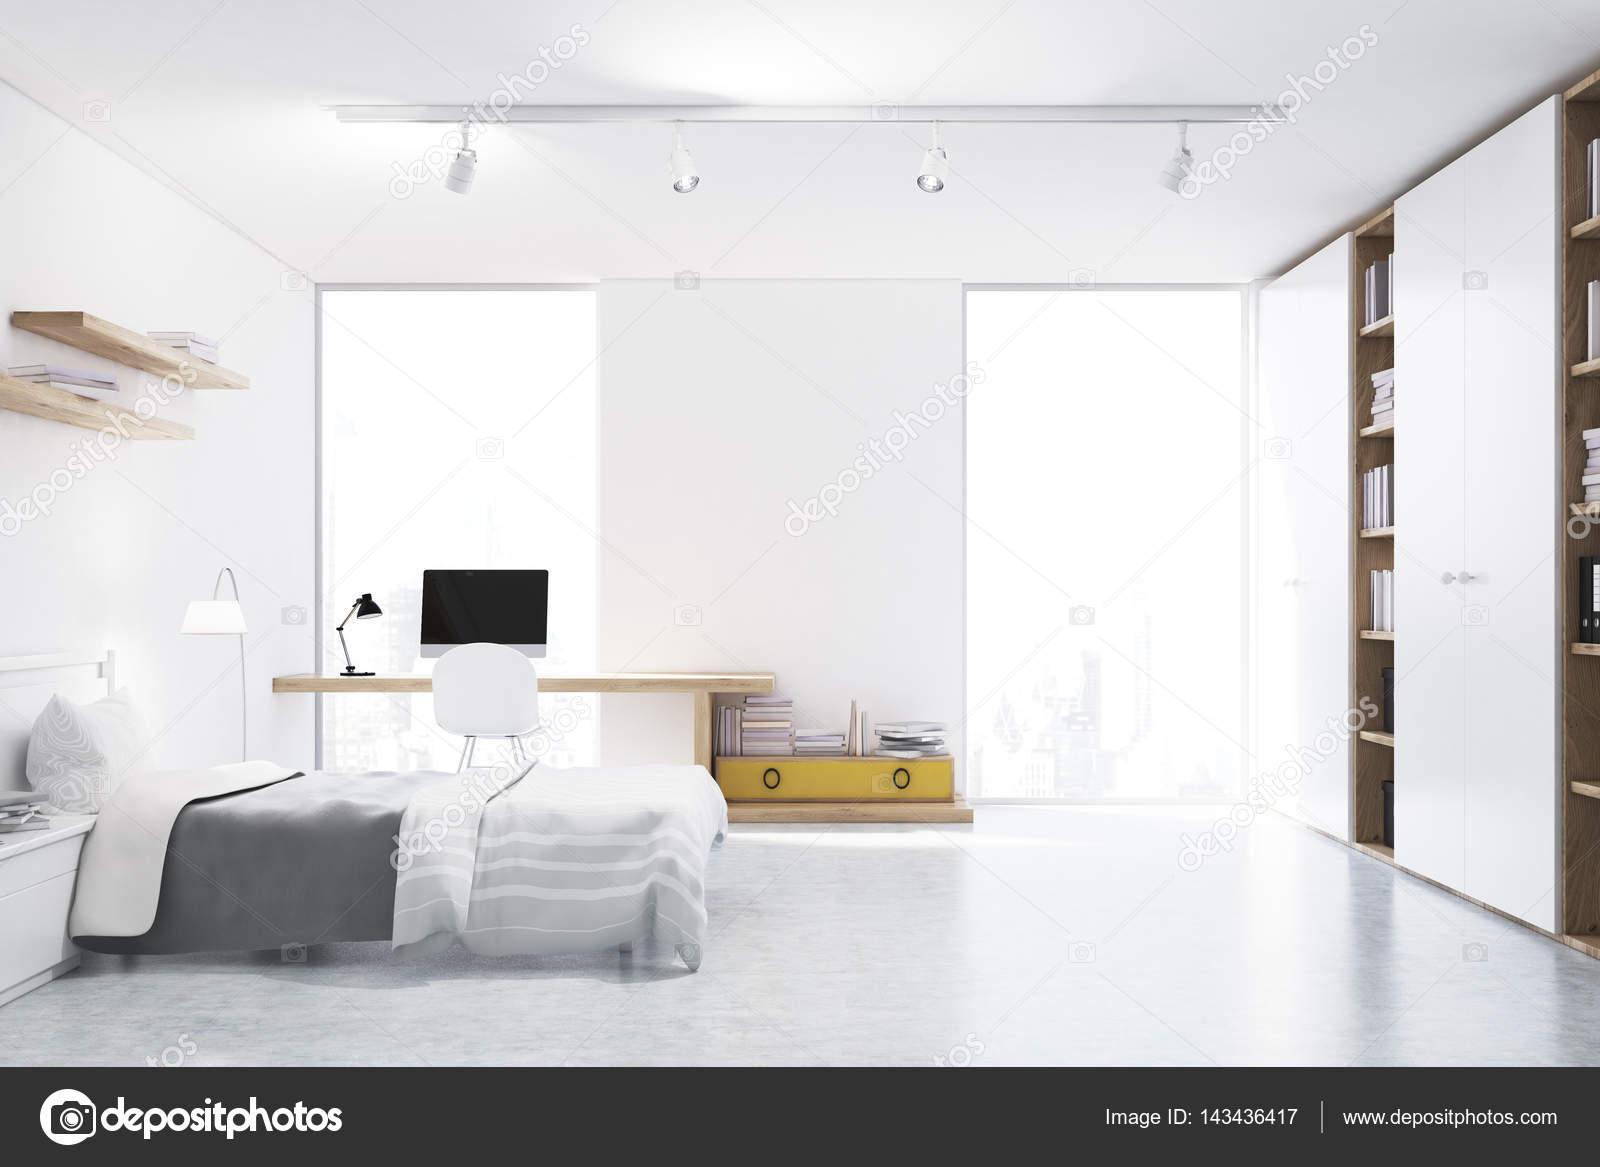 https://st3.depositphotos.com/2673929/14343/i/1600/depositphotos_143436417-stock-photo-white-walled-bedroom-with-study.jpg